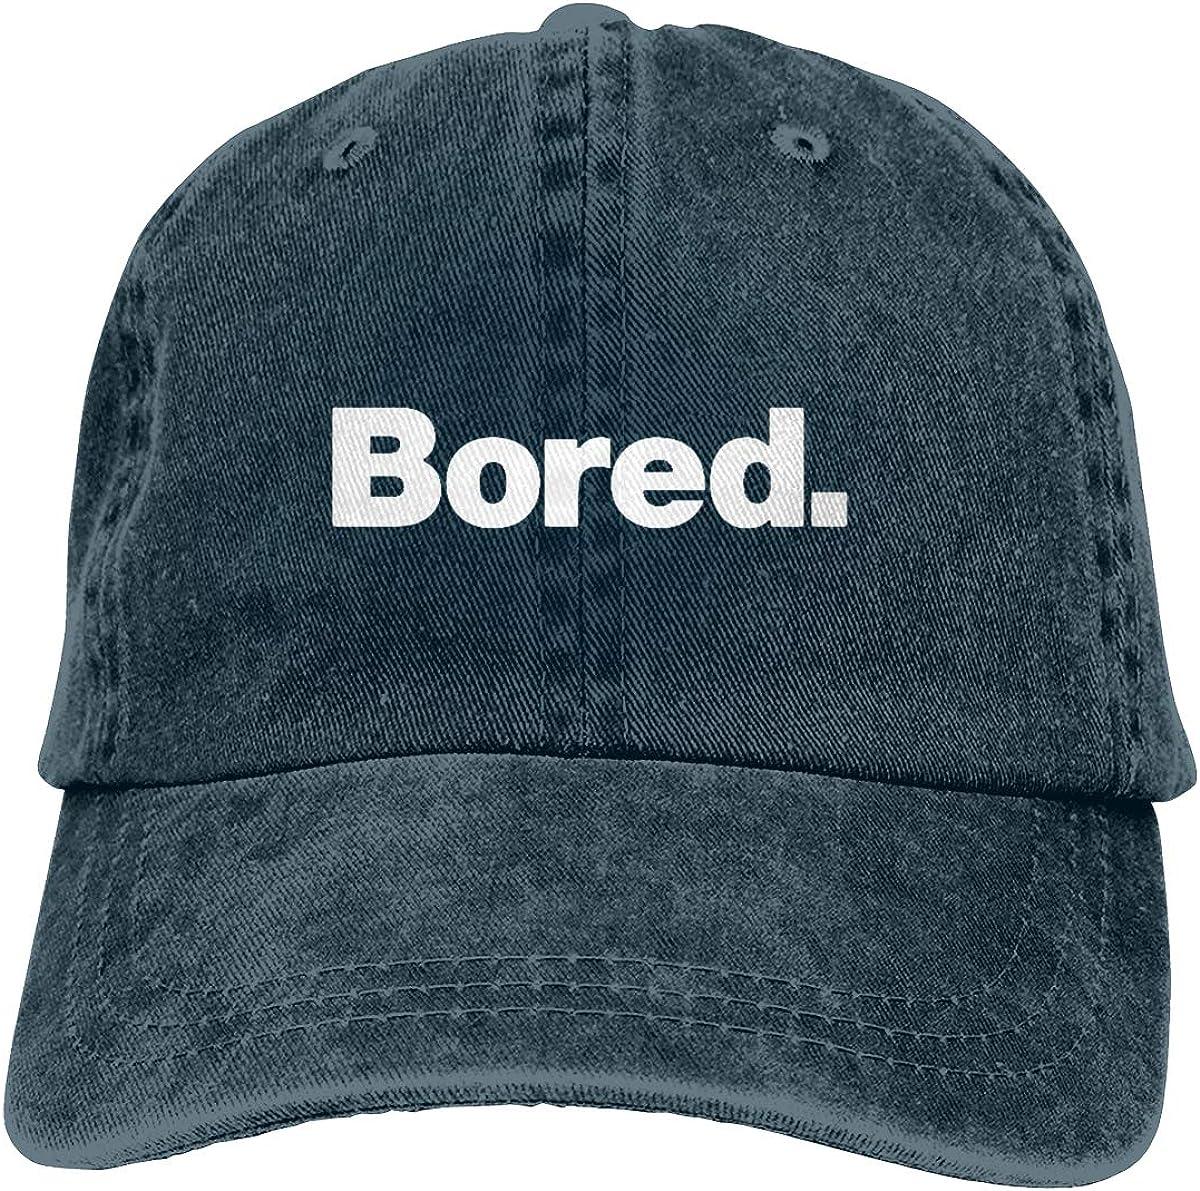 NOT Ran Random Bored Baseball Caps Cowboy Adjustable Unisex